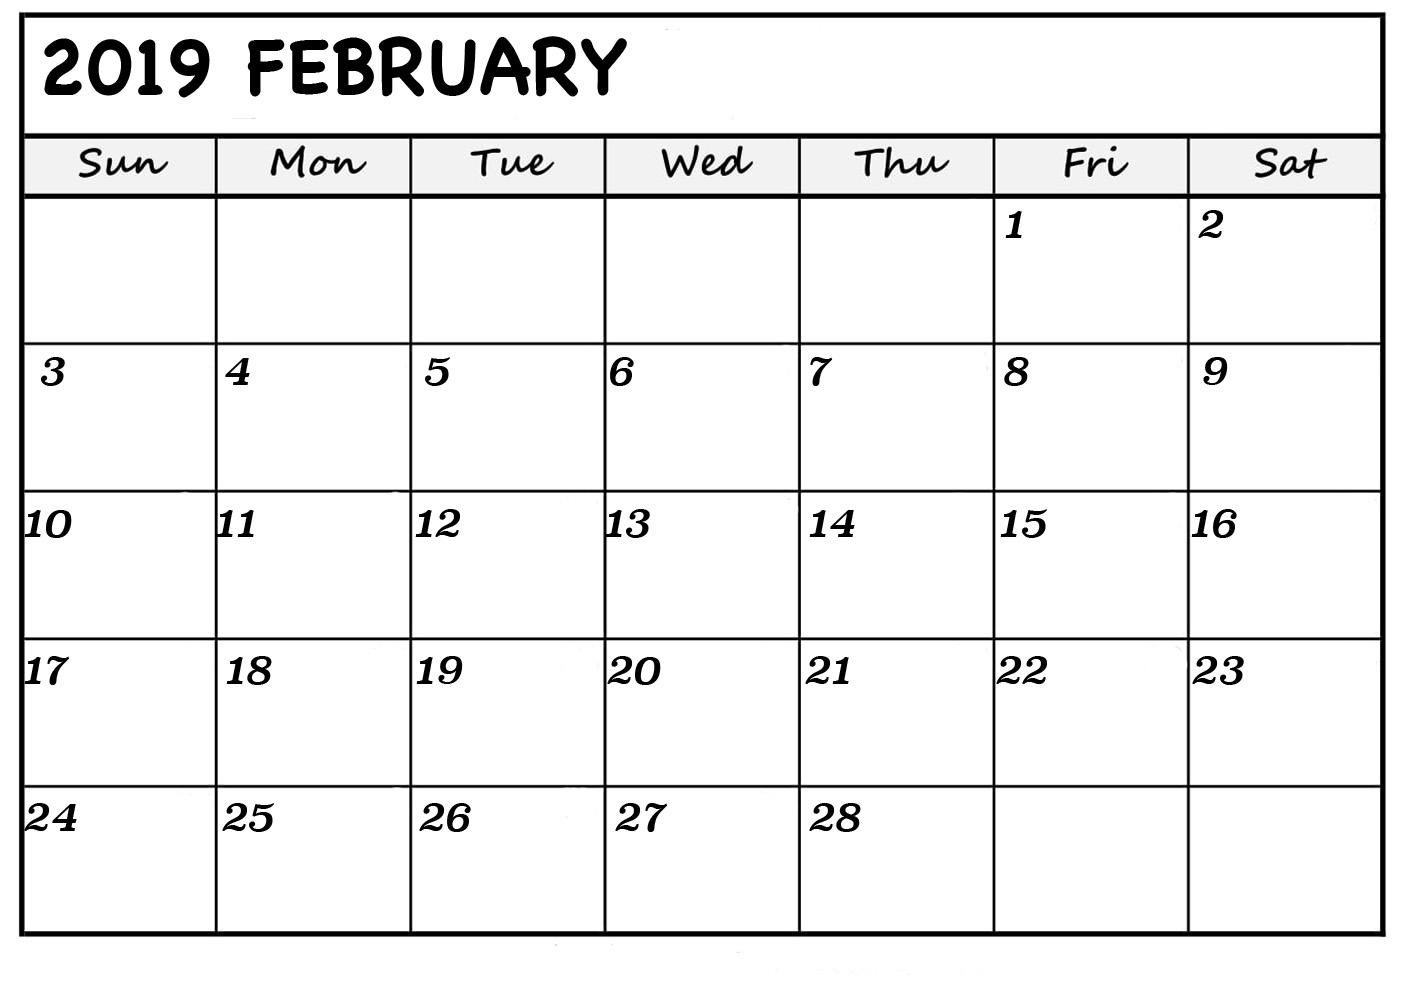 February 2019 Calendar Template Wincalendar February 2019 Calendar Printable   Fresh Calendars